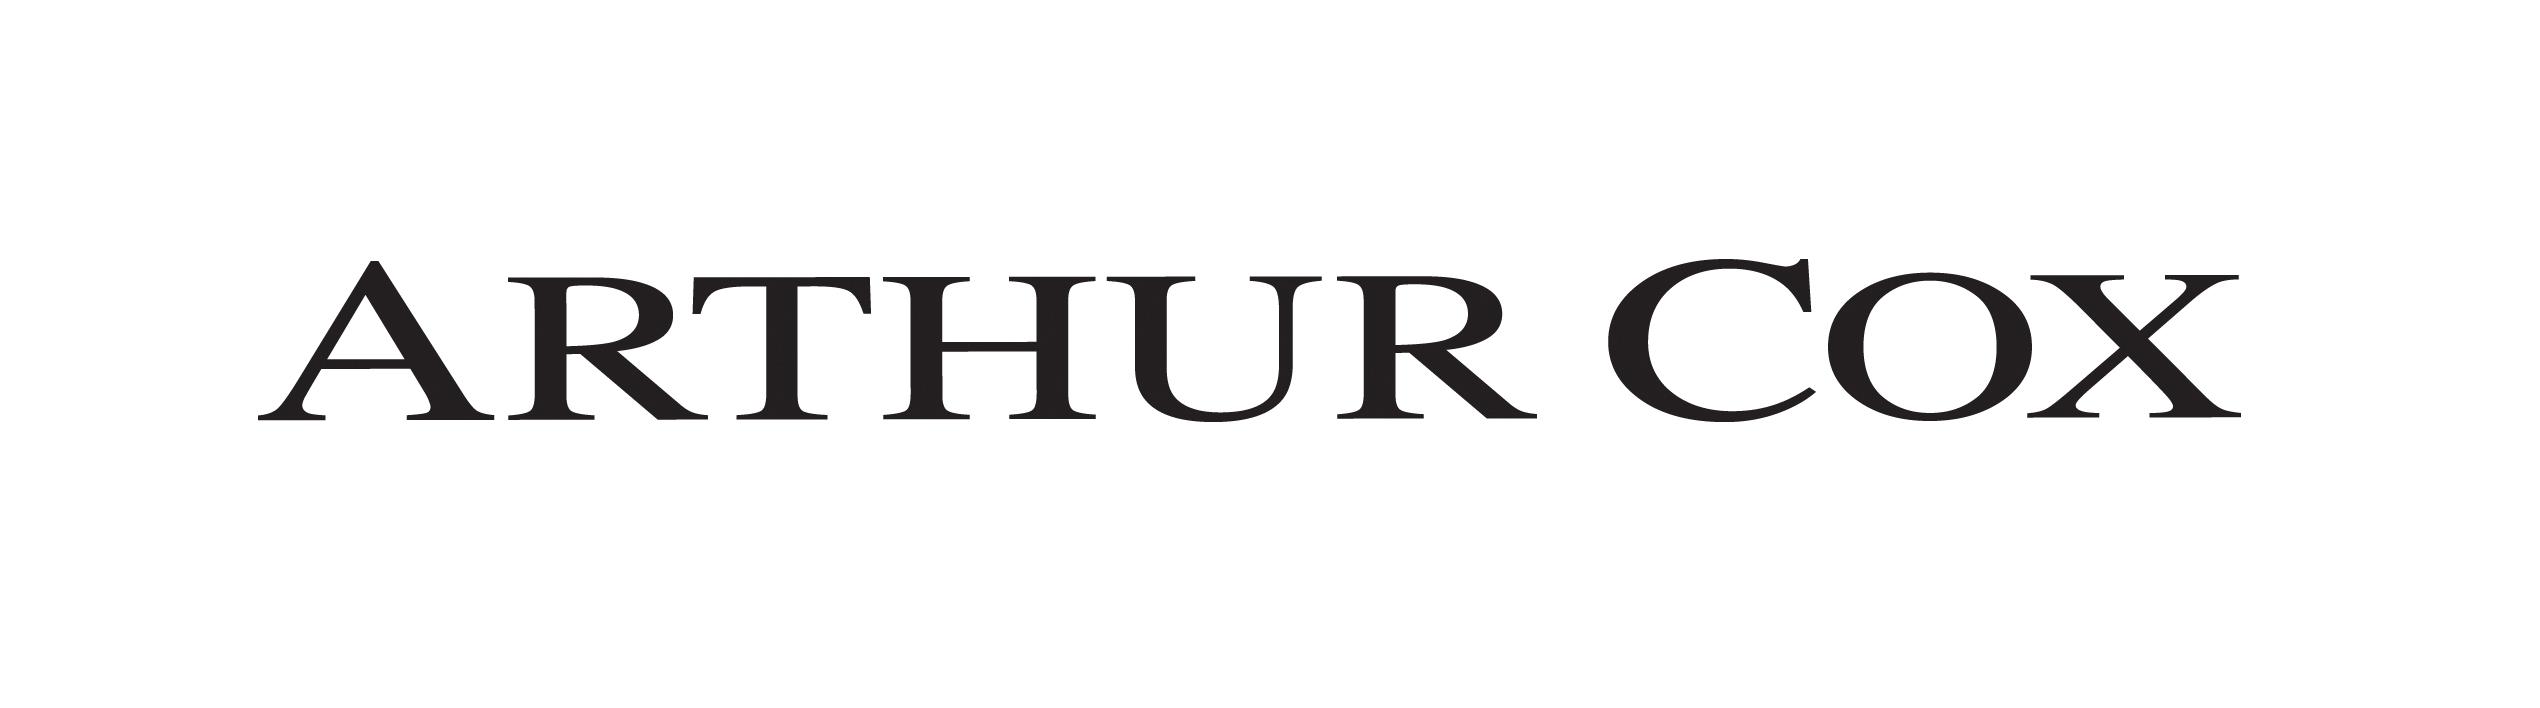 Image result for arthur cox logo